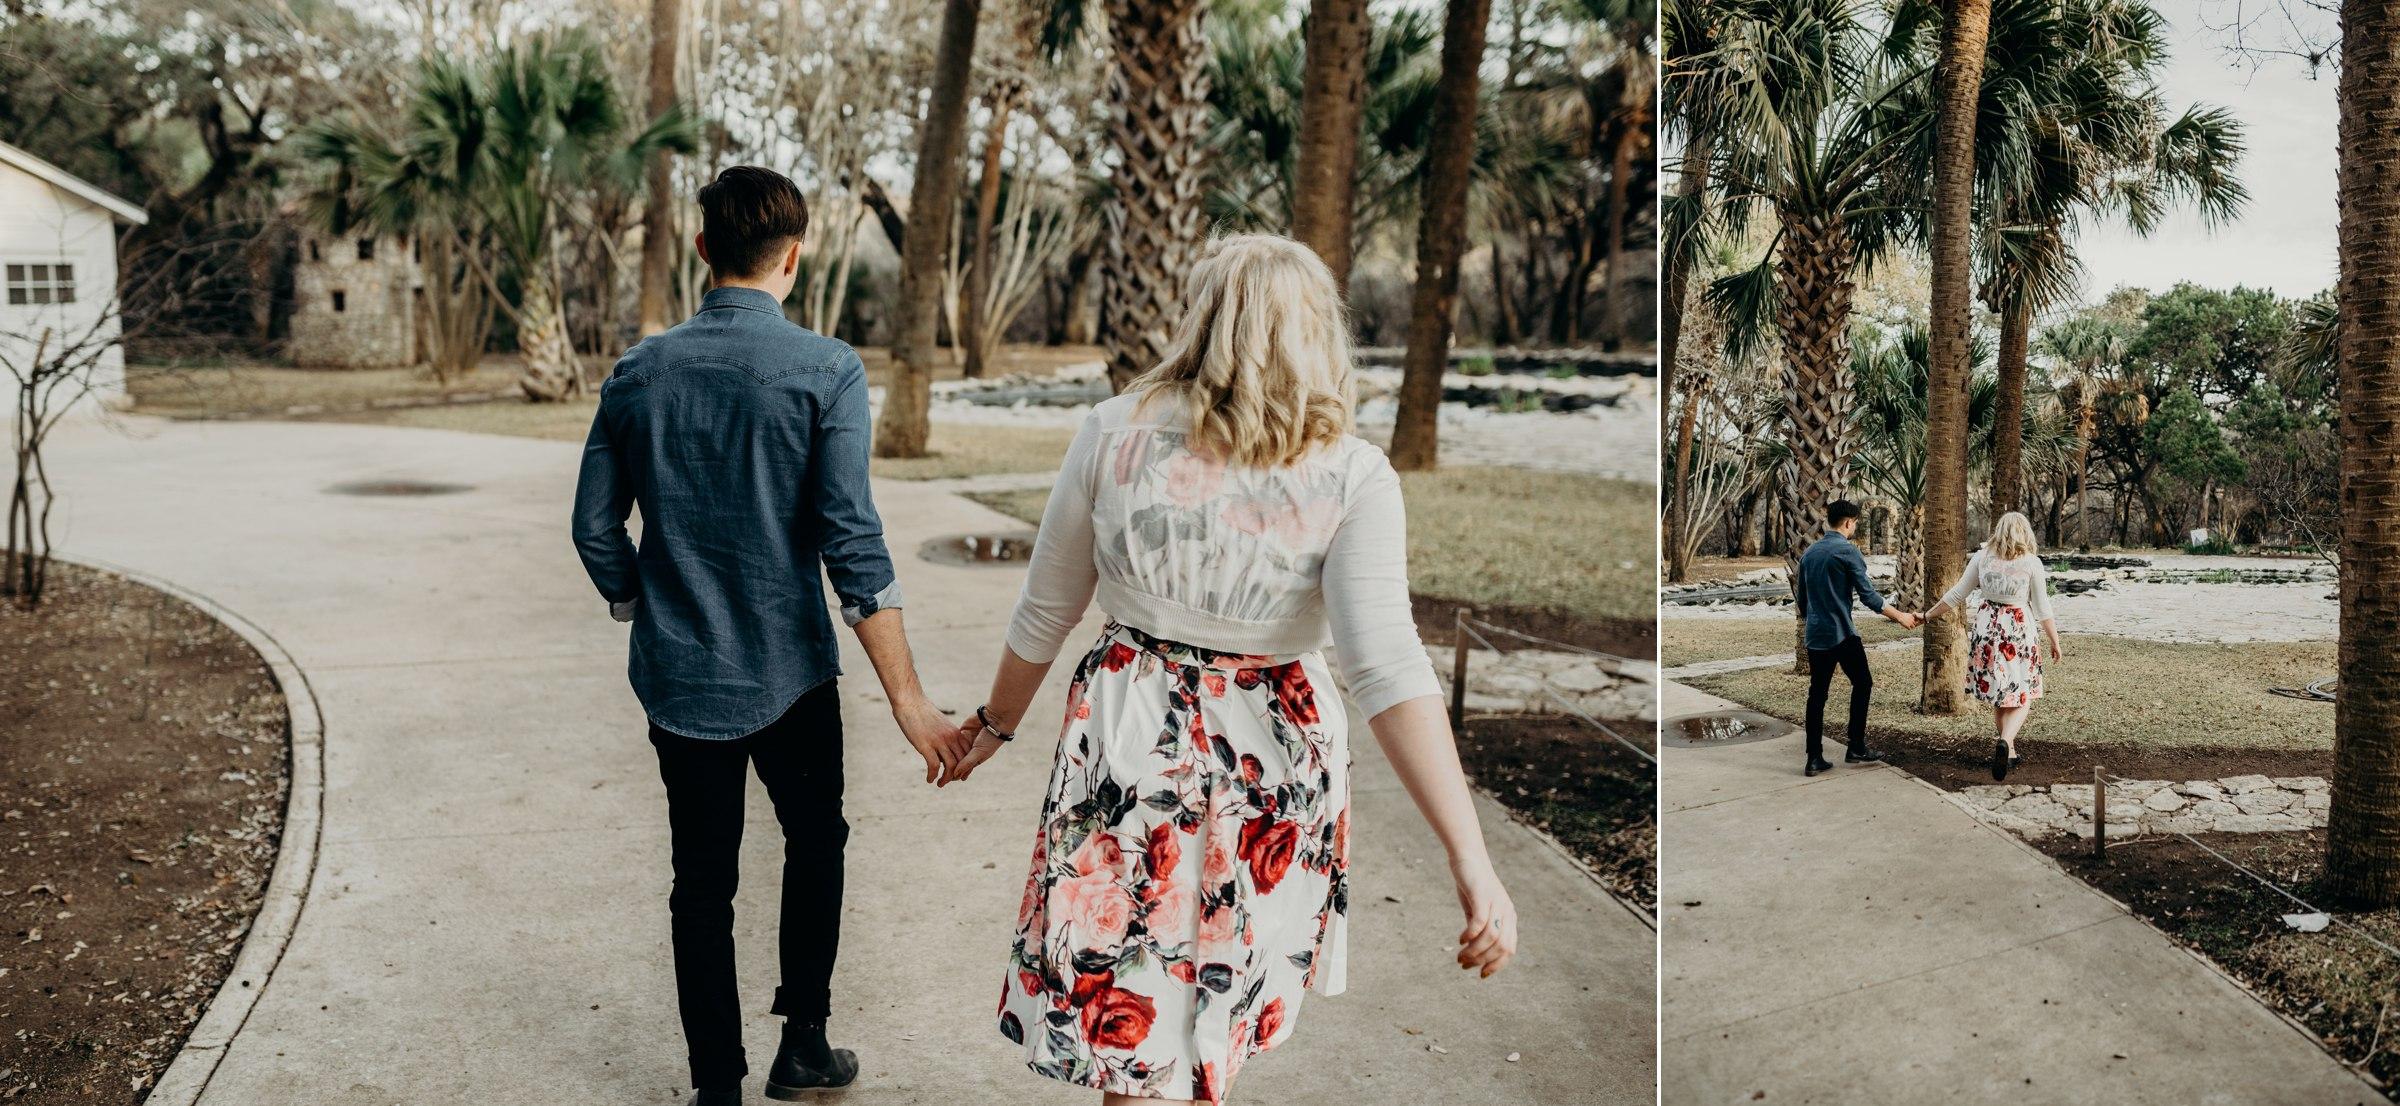 drew-andrew-texas-austin-minnesota-minneapolis-wedding-photographer-destination-elopement-intimate-adventurous_0110.jpg